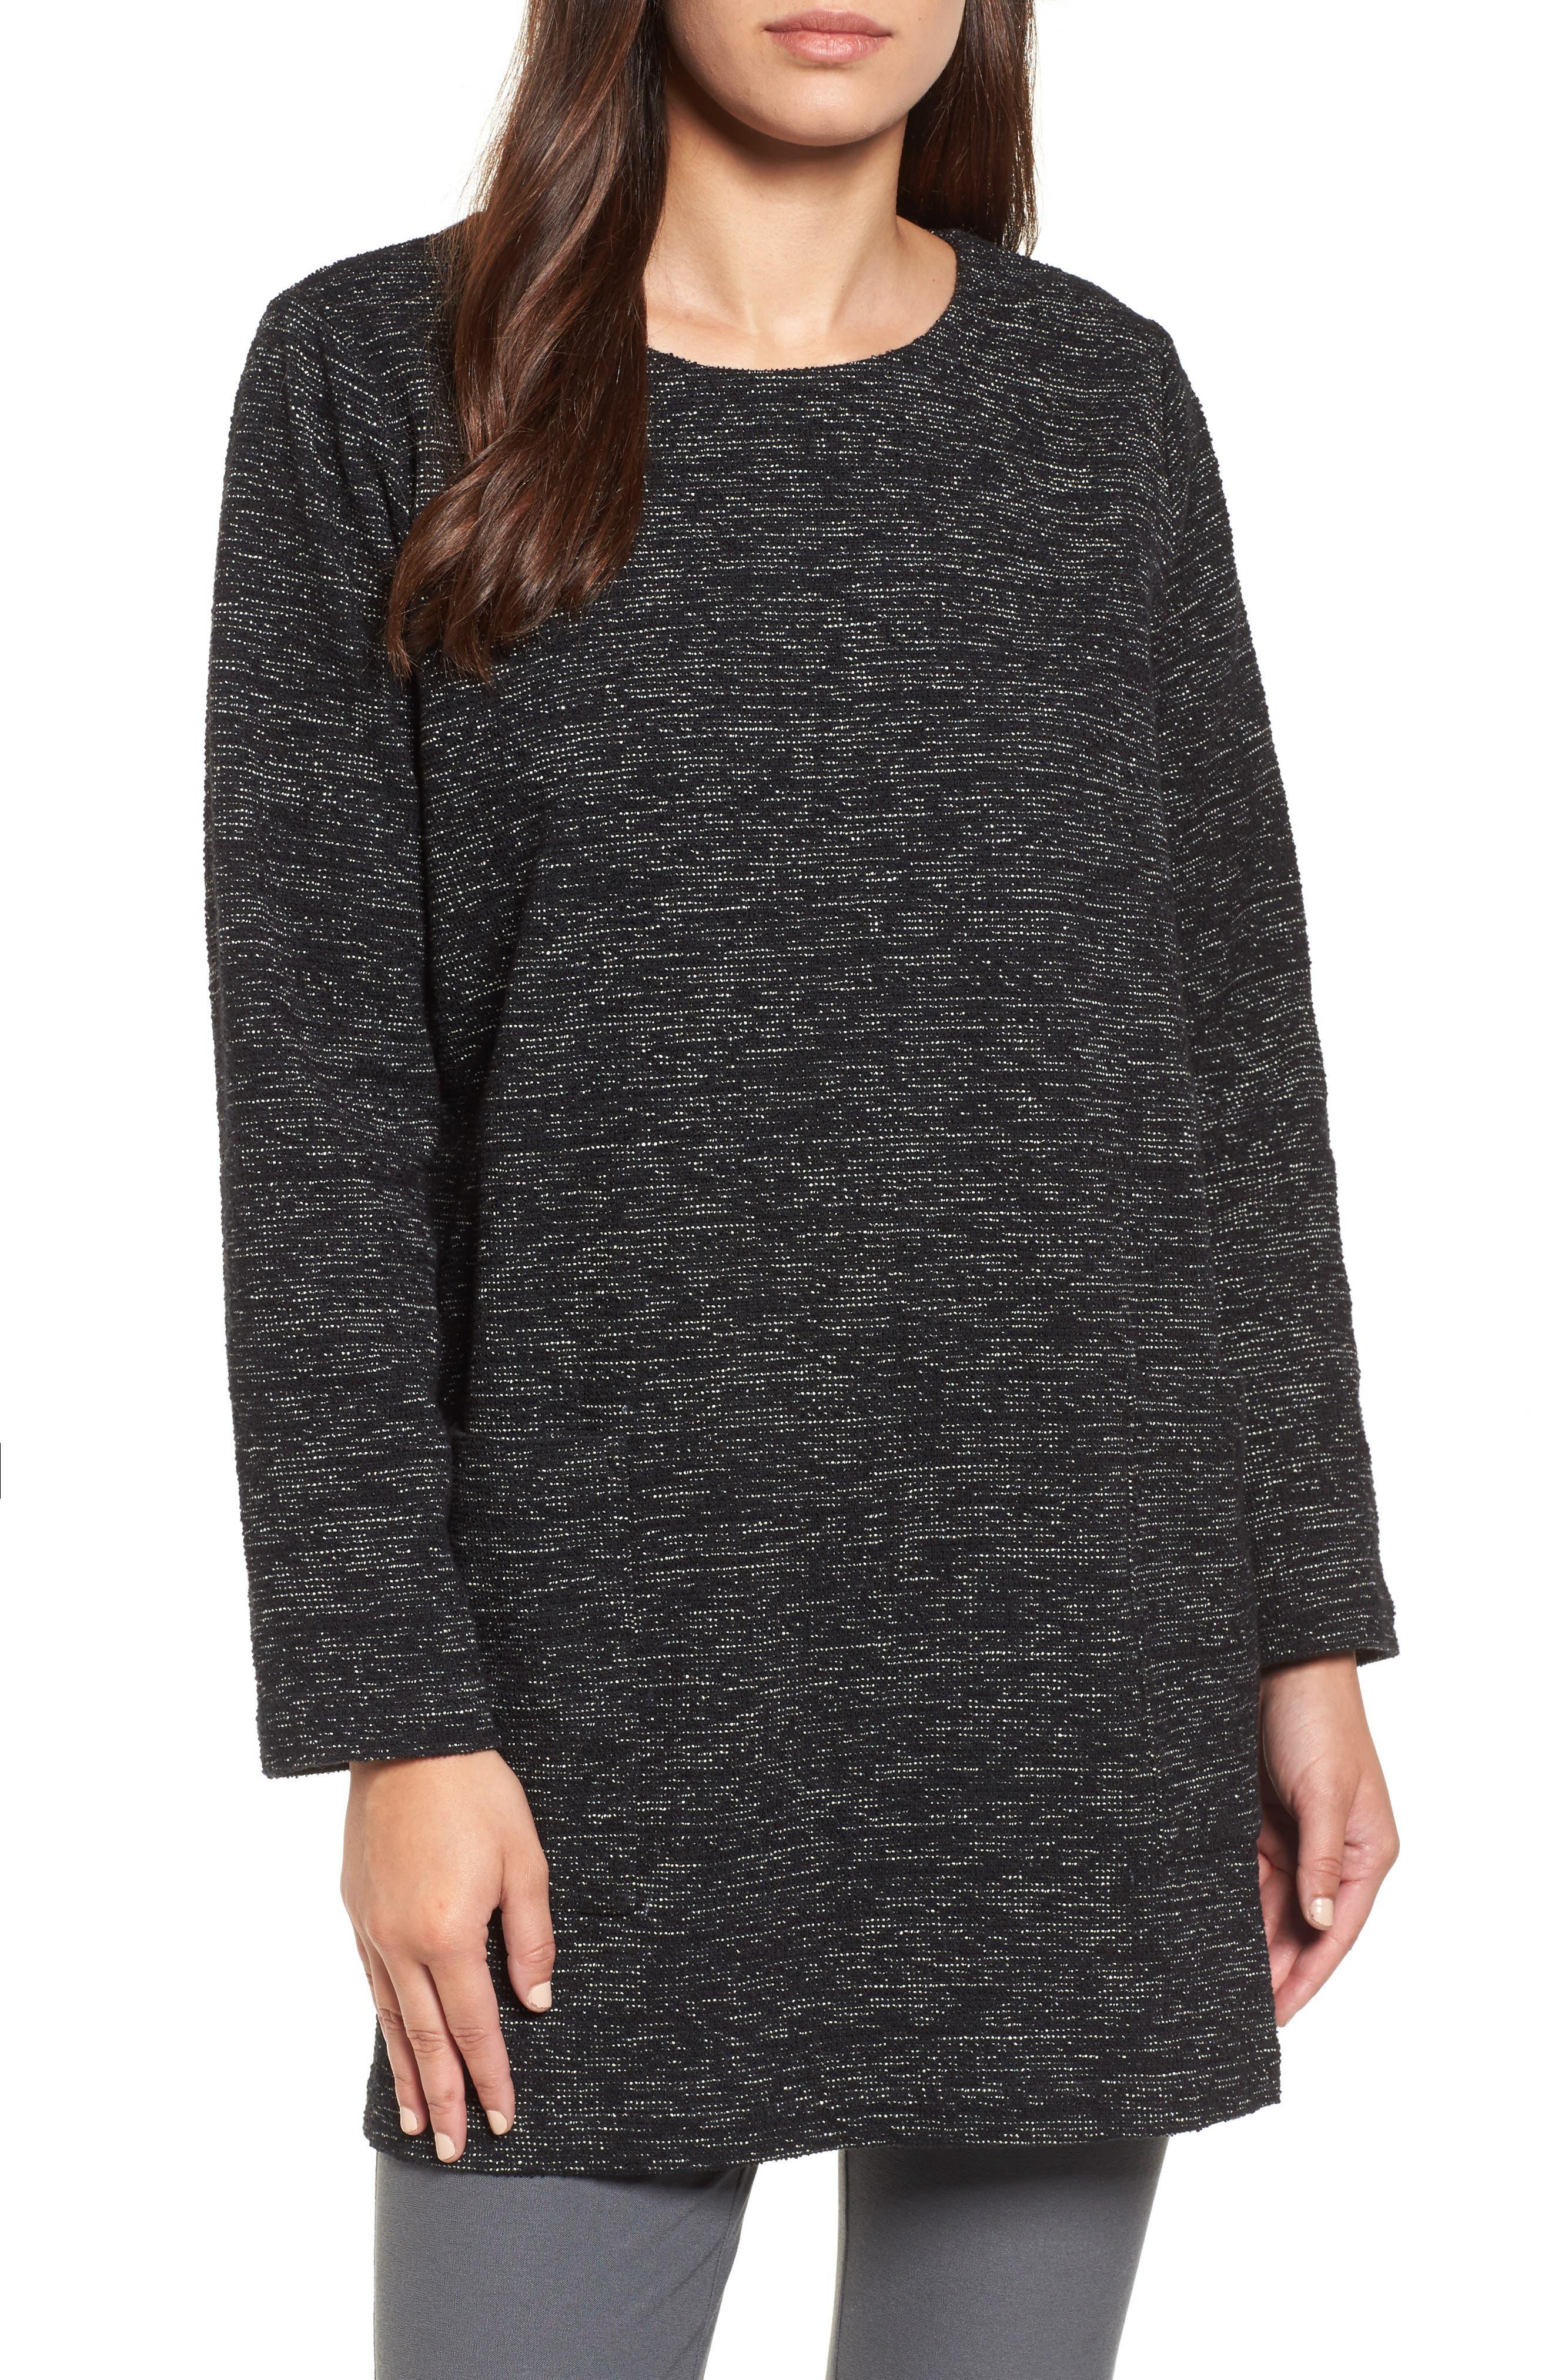 Boxy Organic Cotton Blend Tunic Sweater,                         Main,                         color, 001